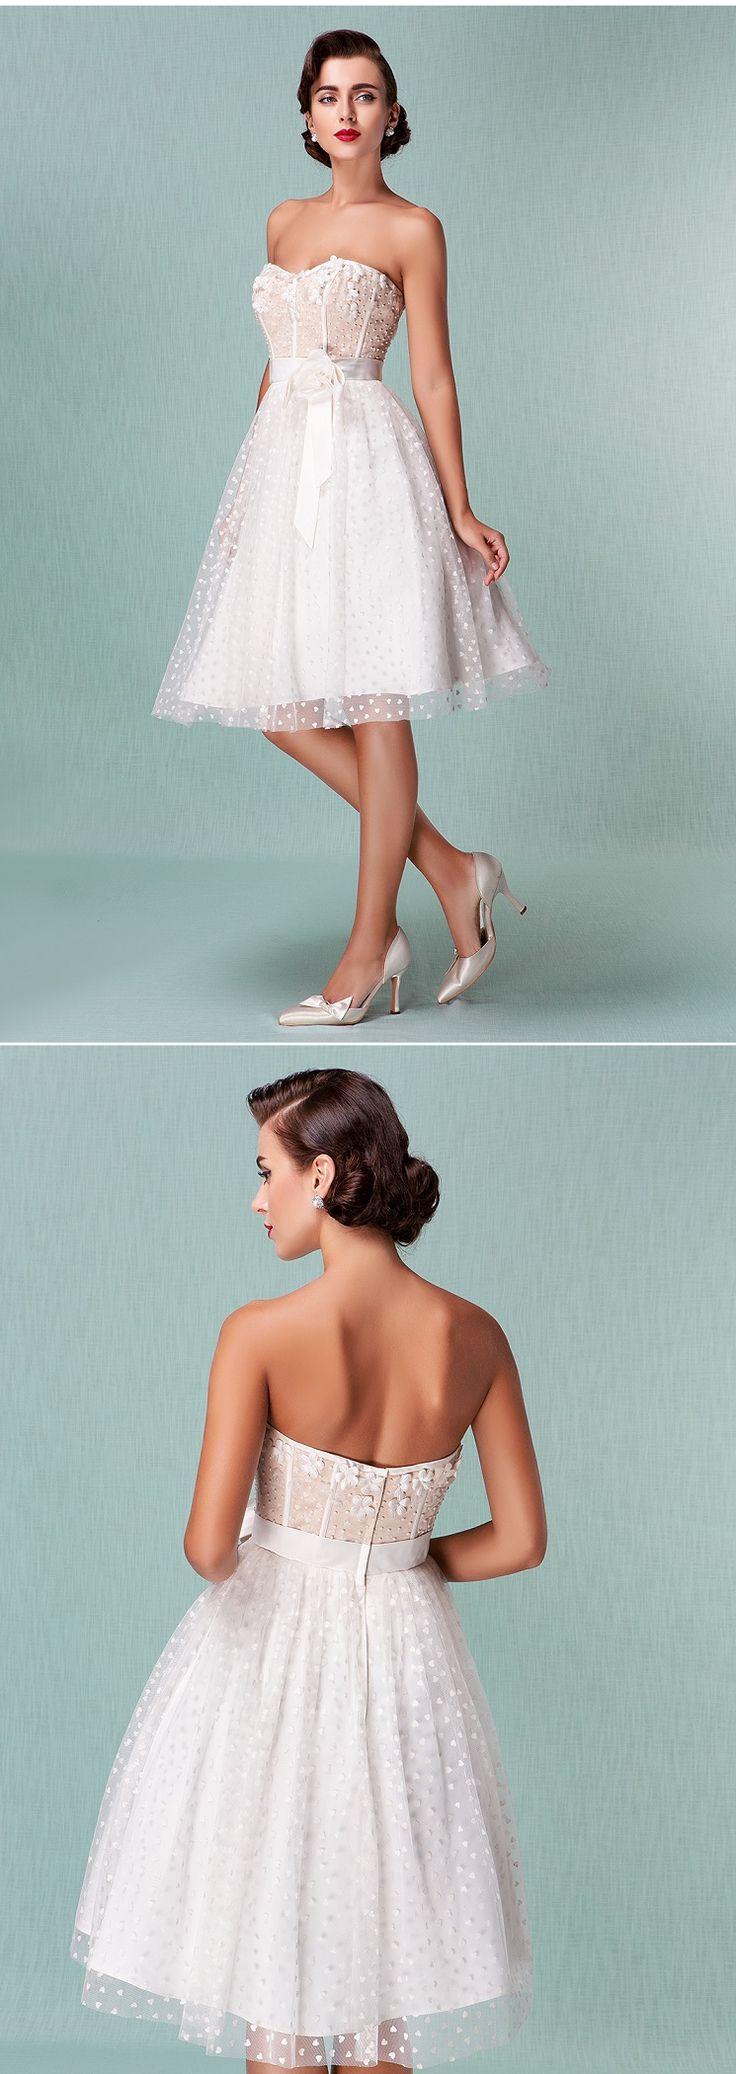 10 best Italy wedding images on Pinterest   Short dress wedding ...